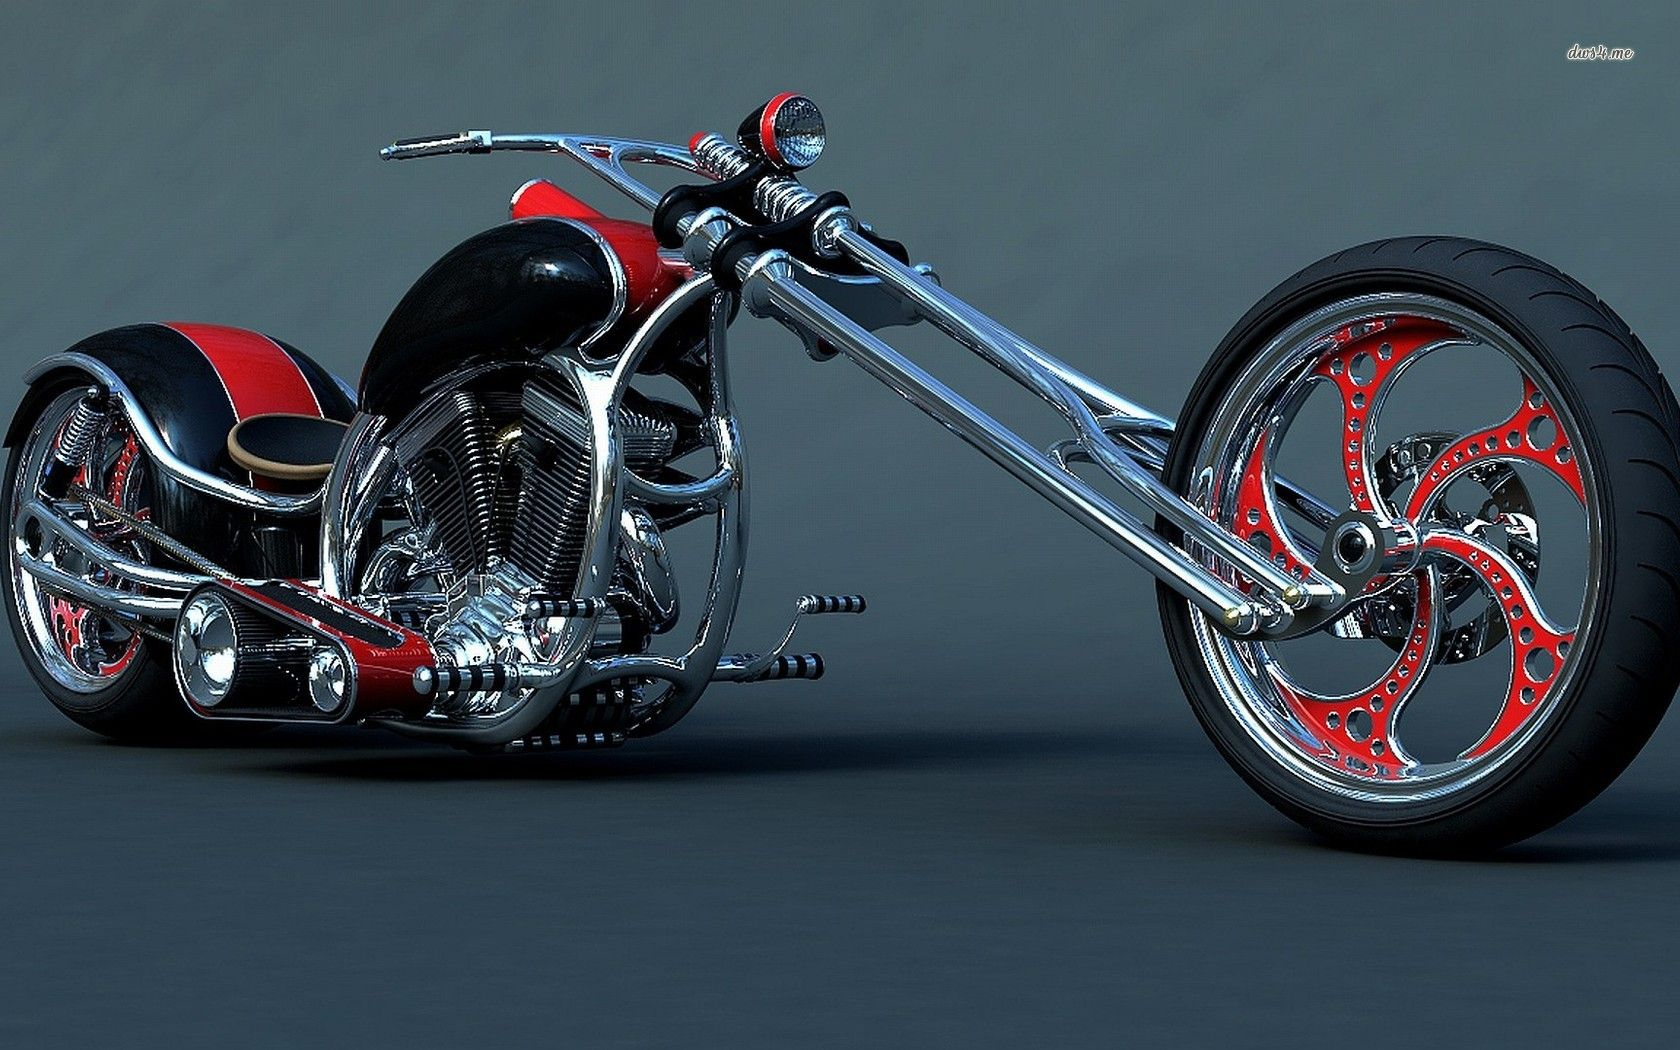 Harley Davidson Wallpapers - DOWNLOAD HD WALLPAPERS | HARLEY ...